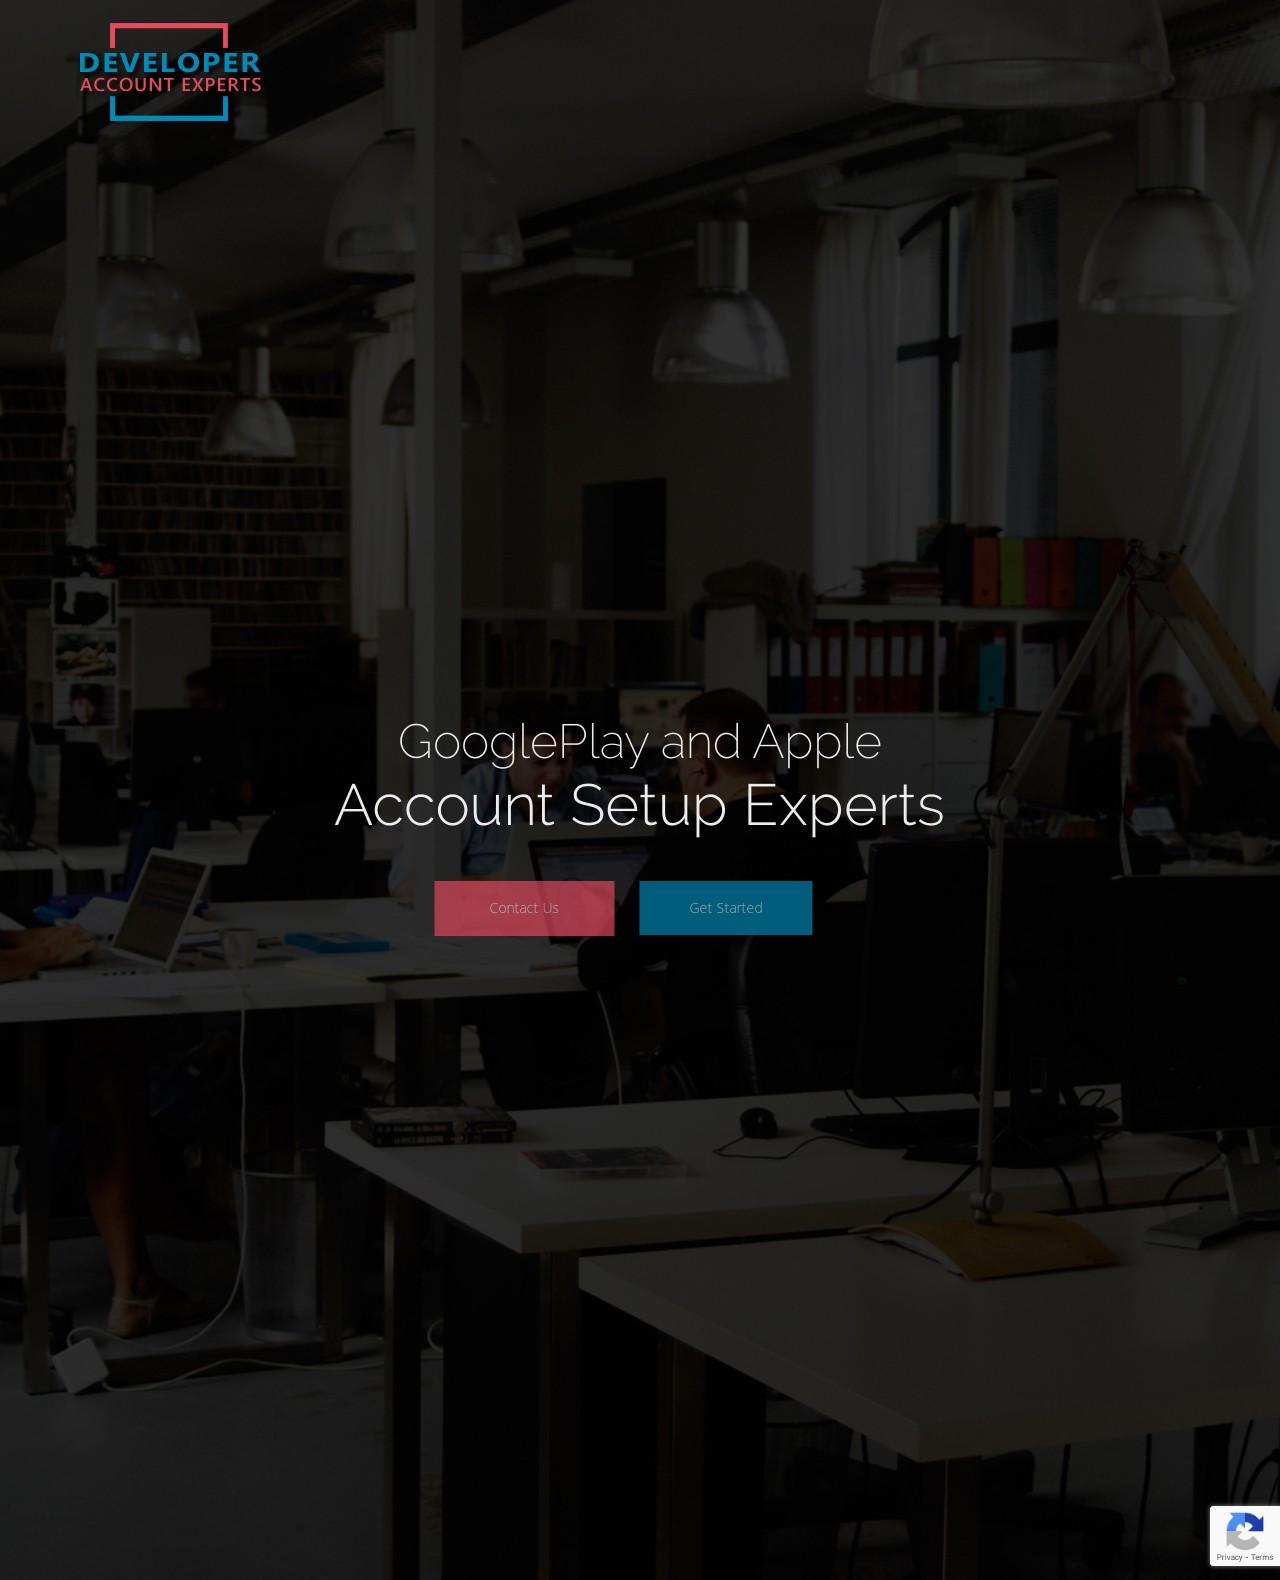 Developer Account Experts Portfolio